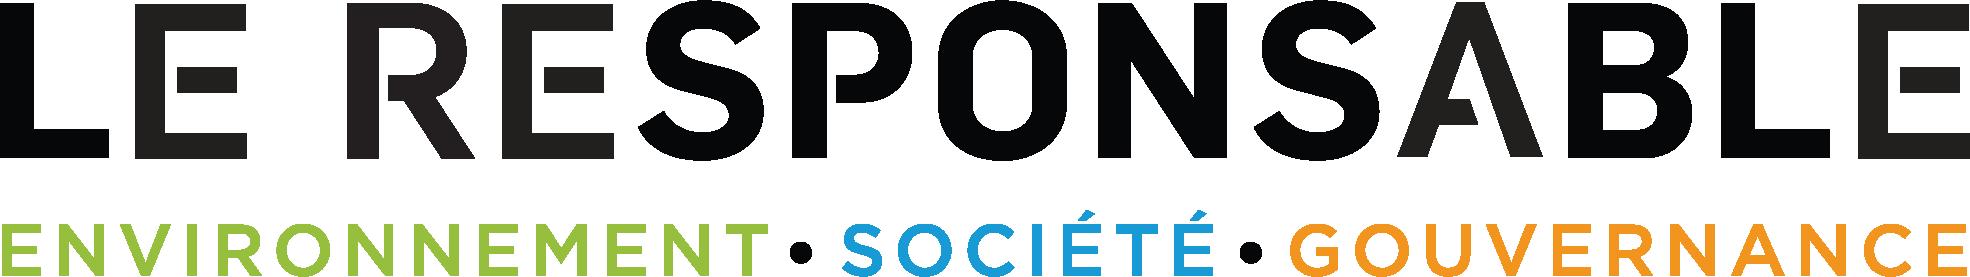 Logo_Le Responsable_CMYK